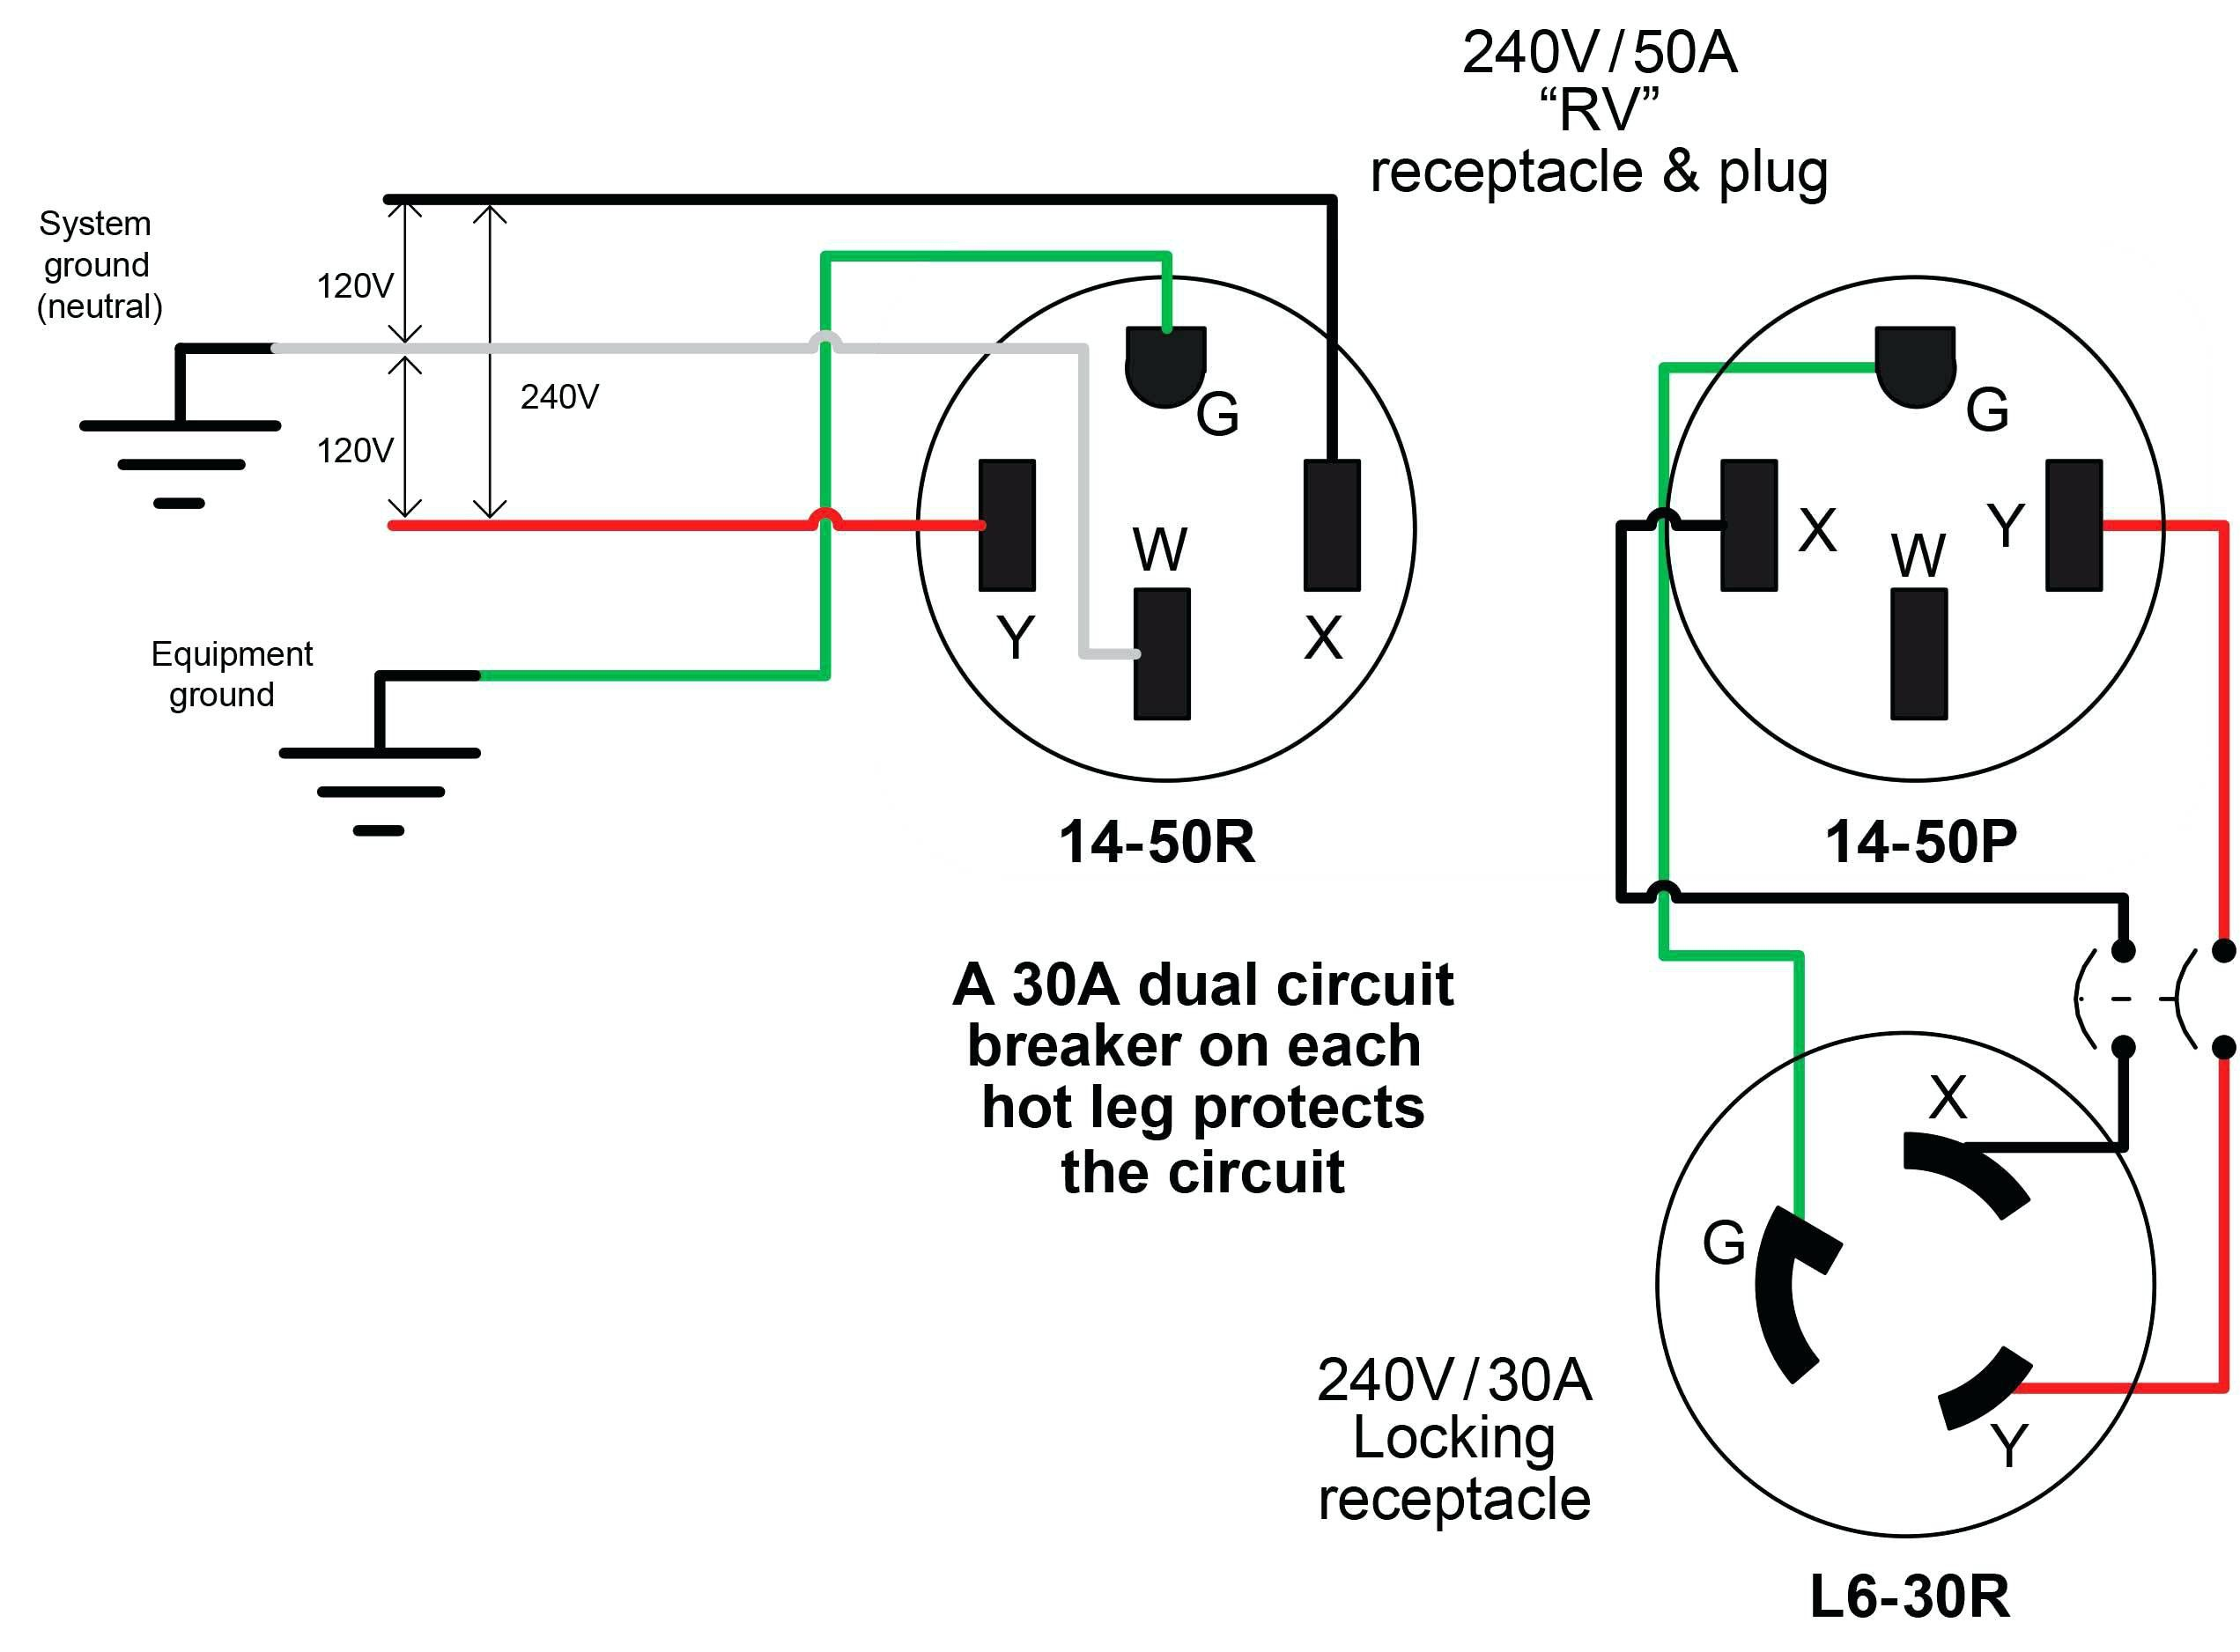 240v dryer plug wiring diagram wiring diagram technic wiring diagram 240v 3 prong plug whirlpool washing machine wiring [ 2543 x 1876 Pixel ]